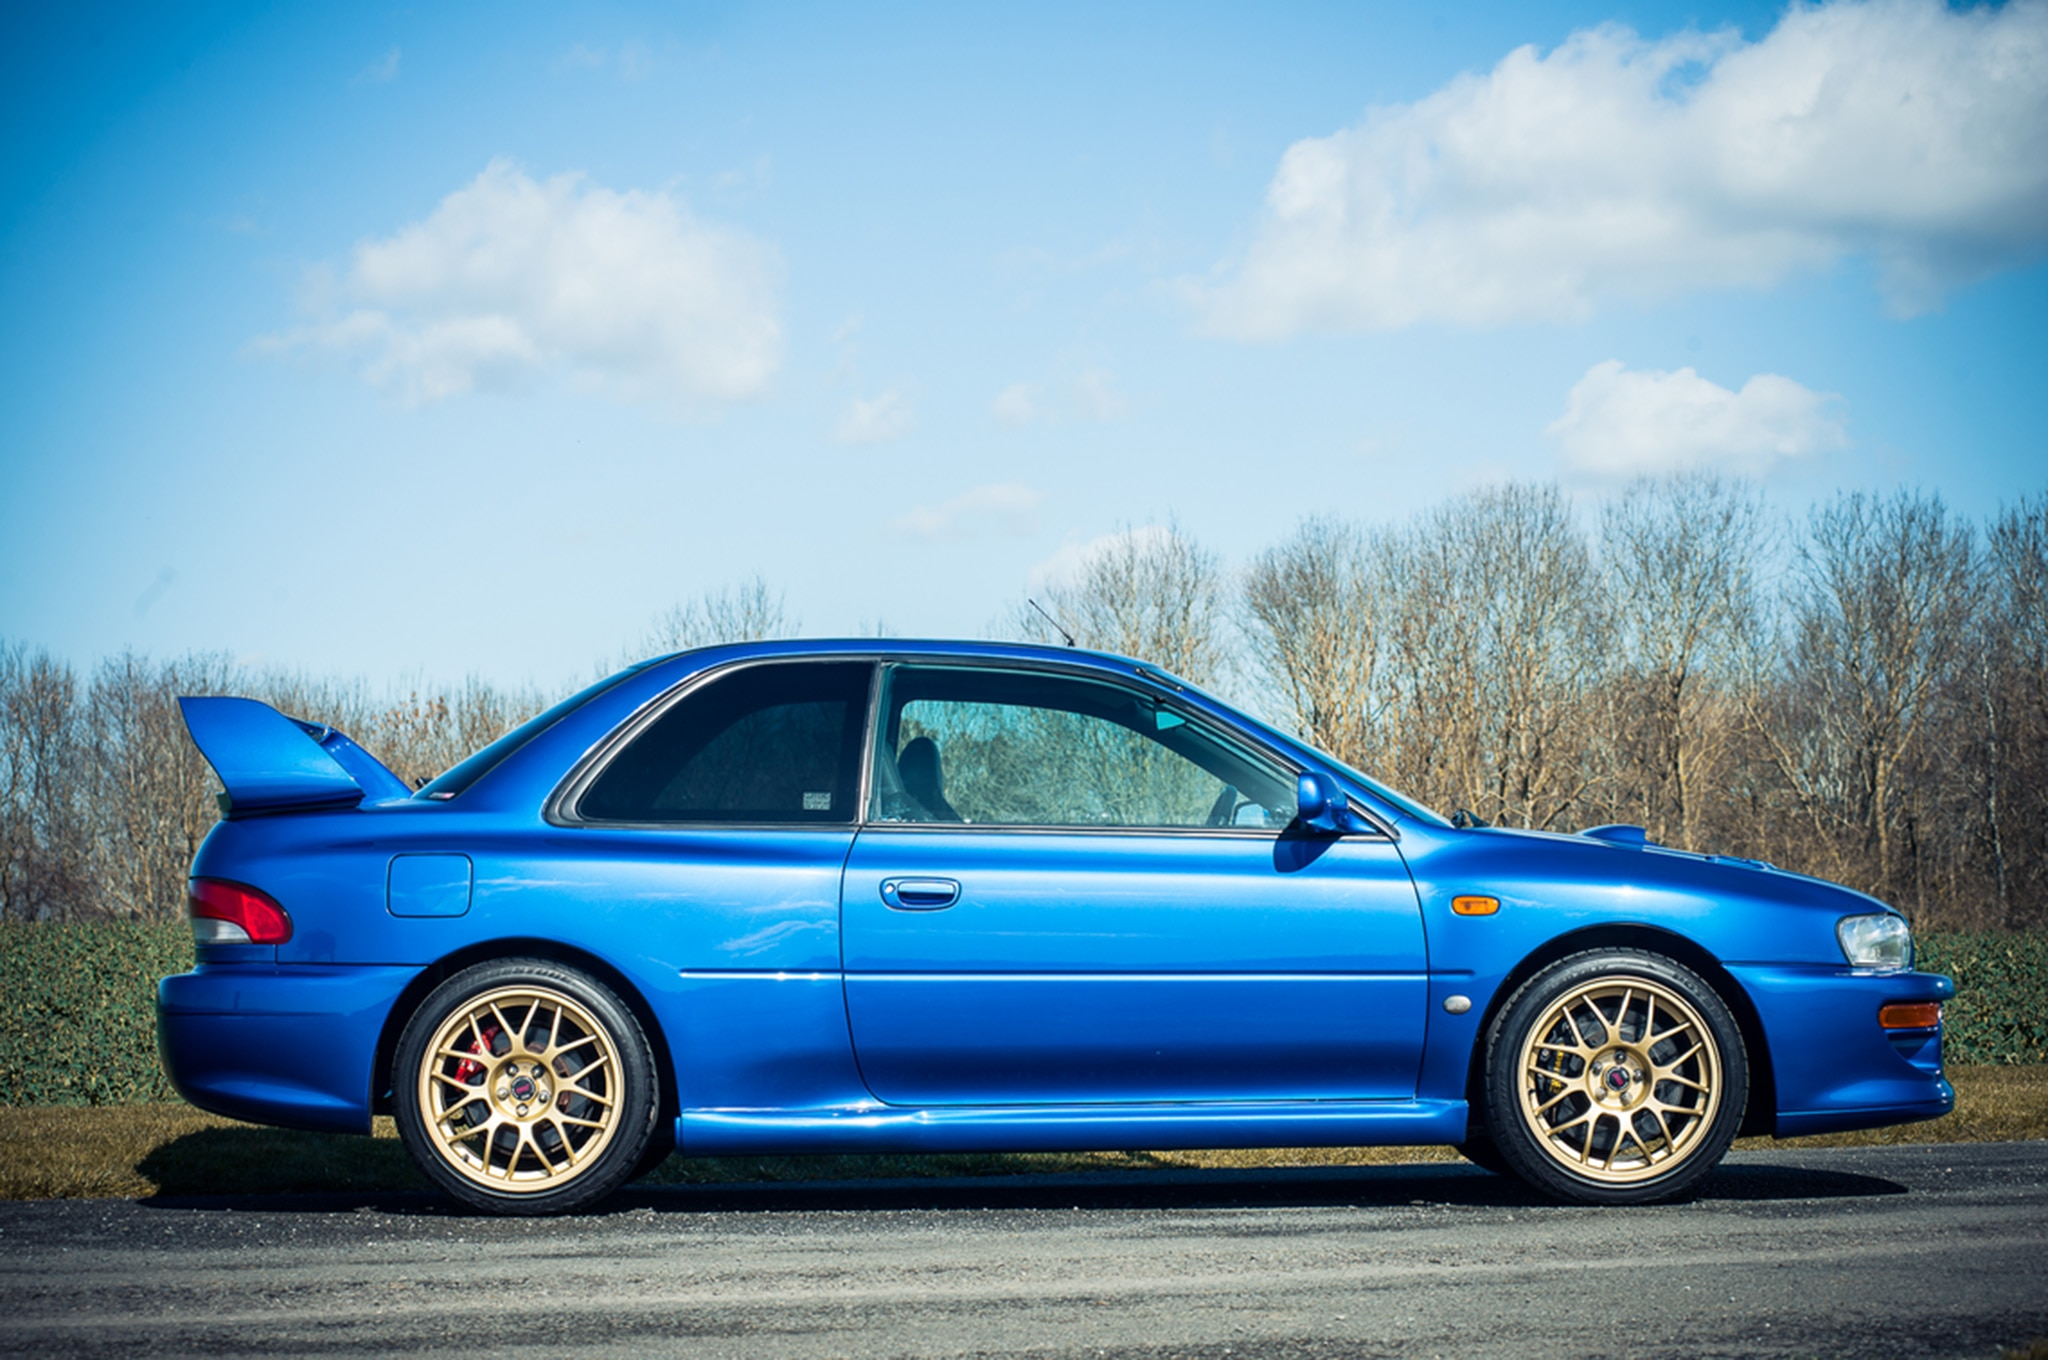 Subaru Wrx Sti Impreza 2017 >> Rare 1998 Subaru Impreza STI 22B Heads to Auction | Automobile Magazine